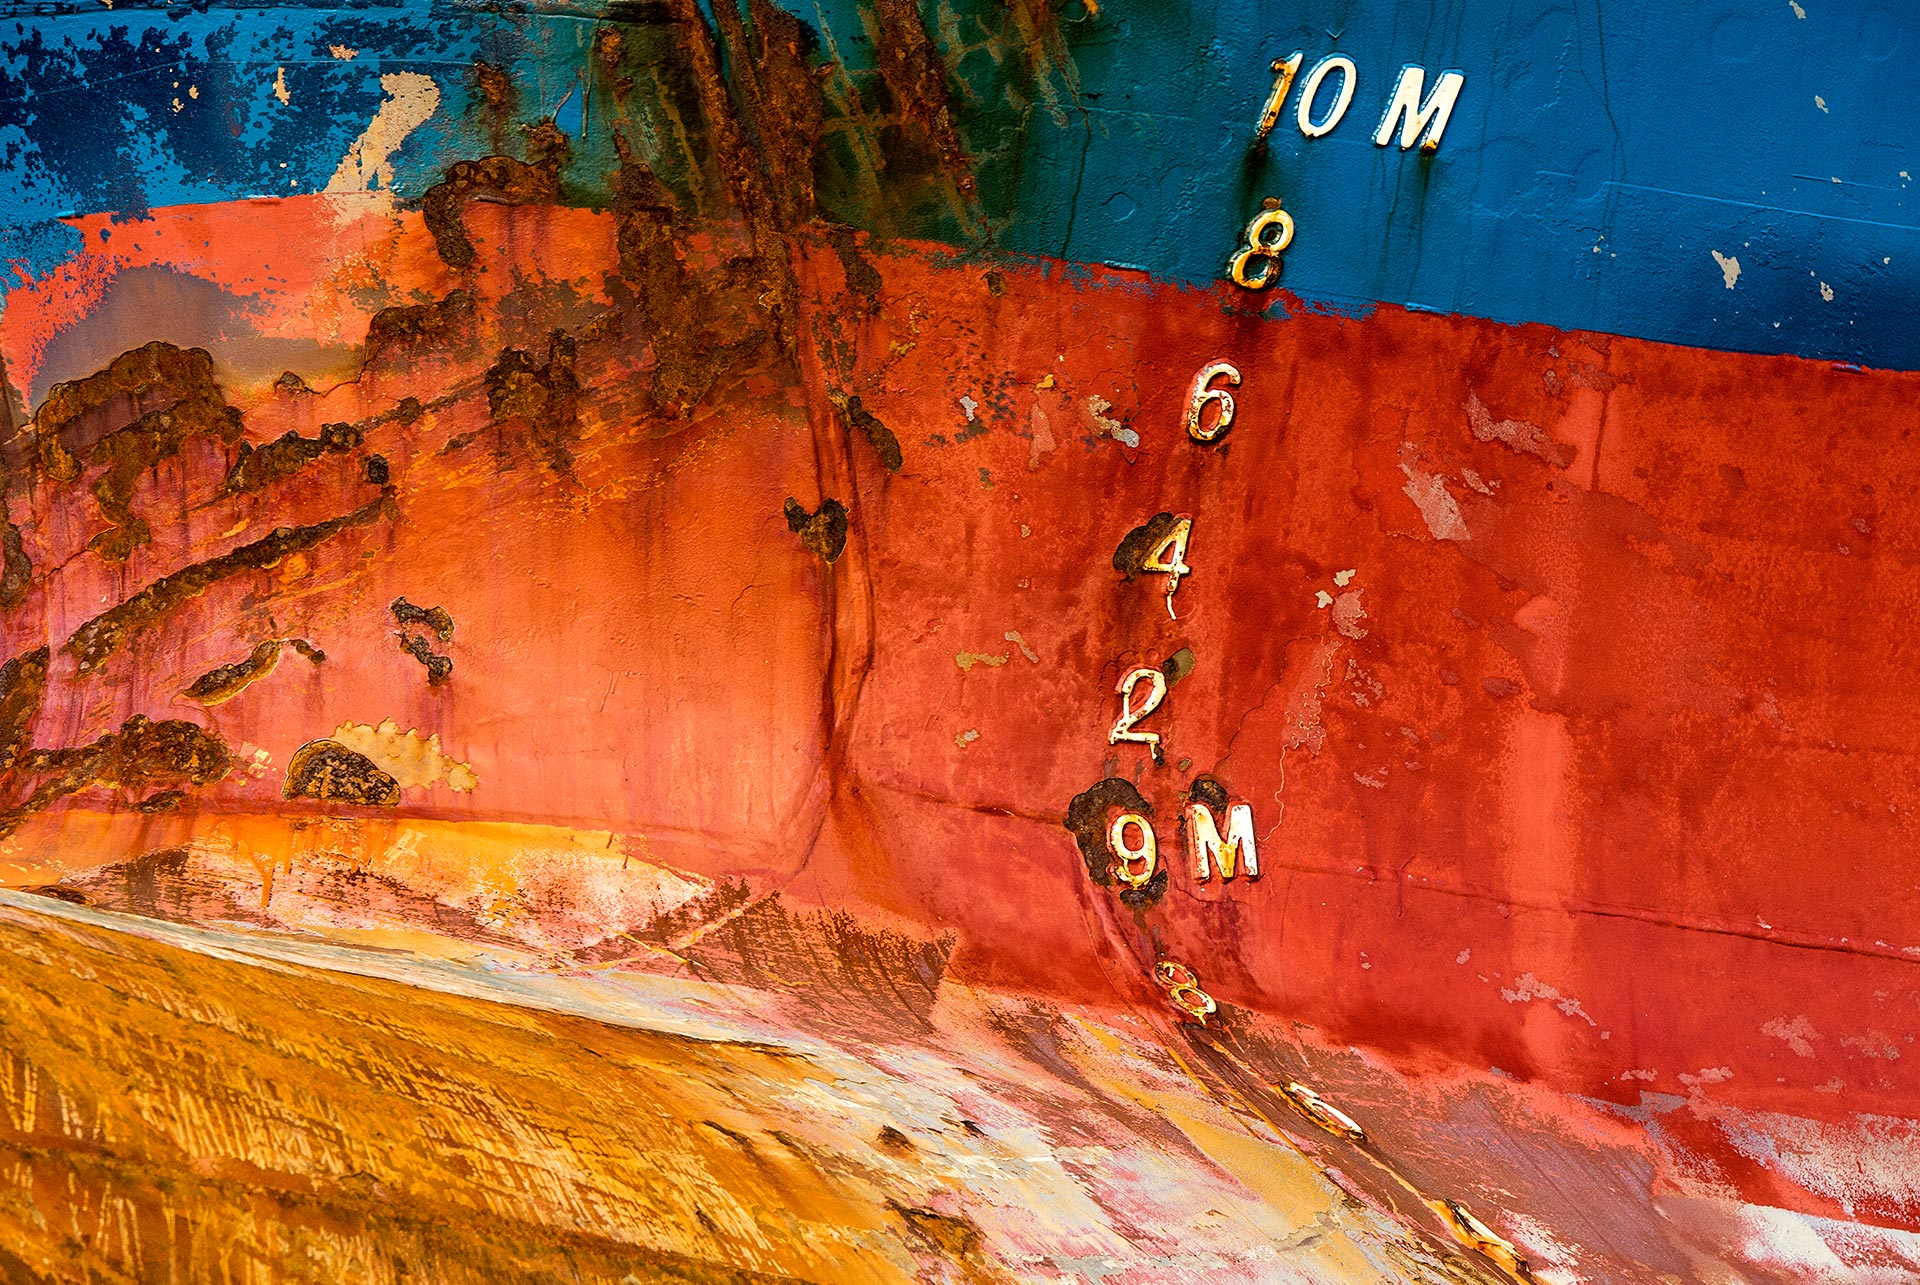 NL050 Schiffswand Tiefgang Hamburg-Wandbild auf Leinwand, Dibond oder hinter Acylglas